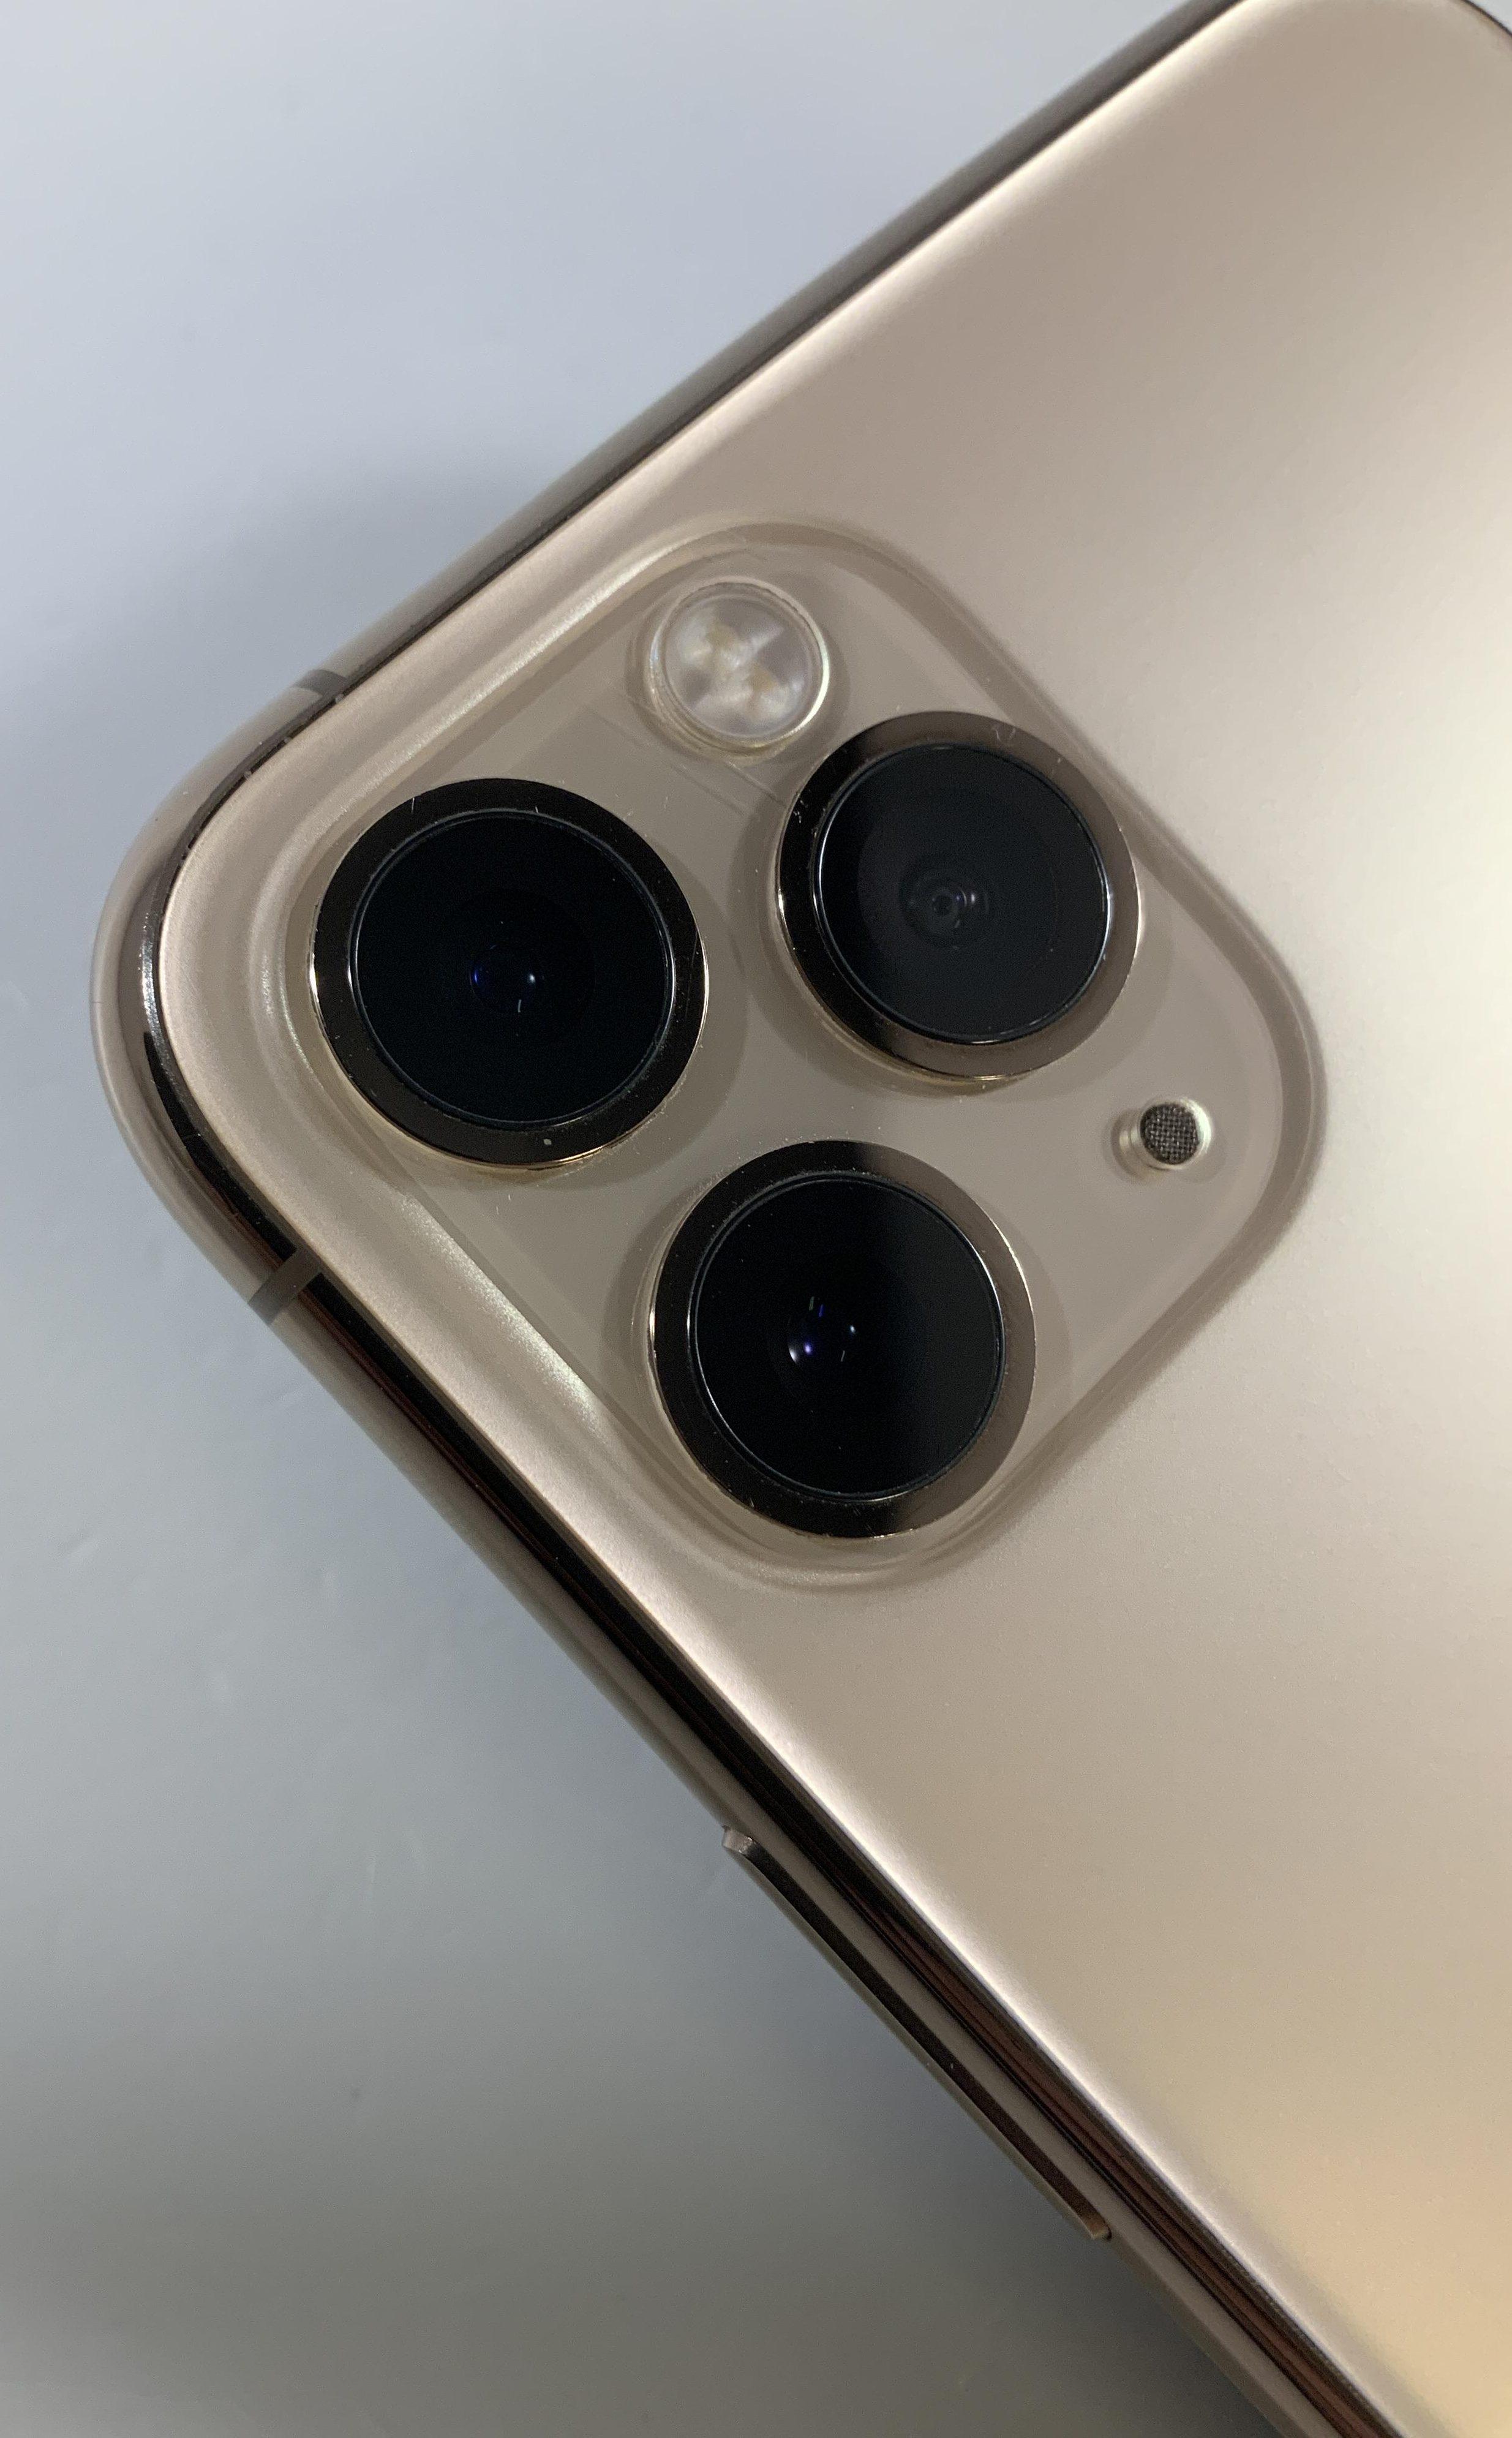 iPhone 11 Pro 64GB, 64GB, Gold, immagine 3